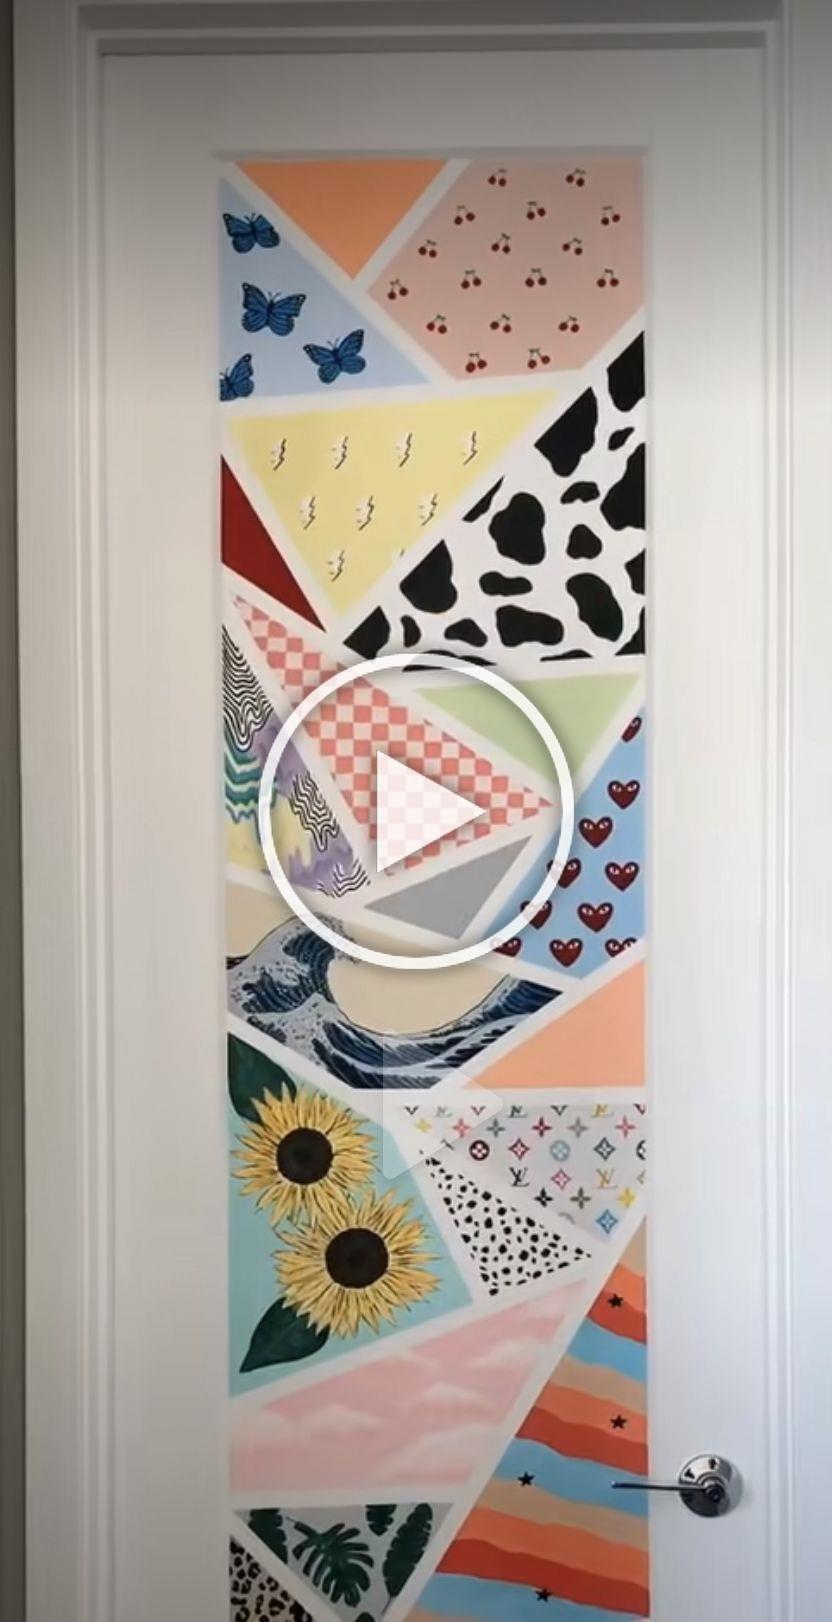 Tiktok Painting Aesthetic Bedroom Stencil Ideas Tiktok Painting Aesthetic Painting Wall Wall Tumblr Room Decor Room Wall Painting Diy Canvas Art Painting